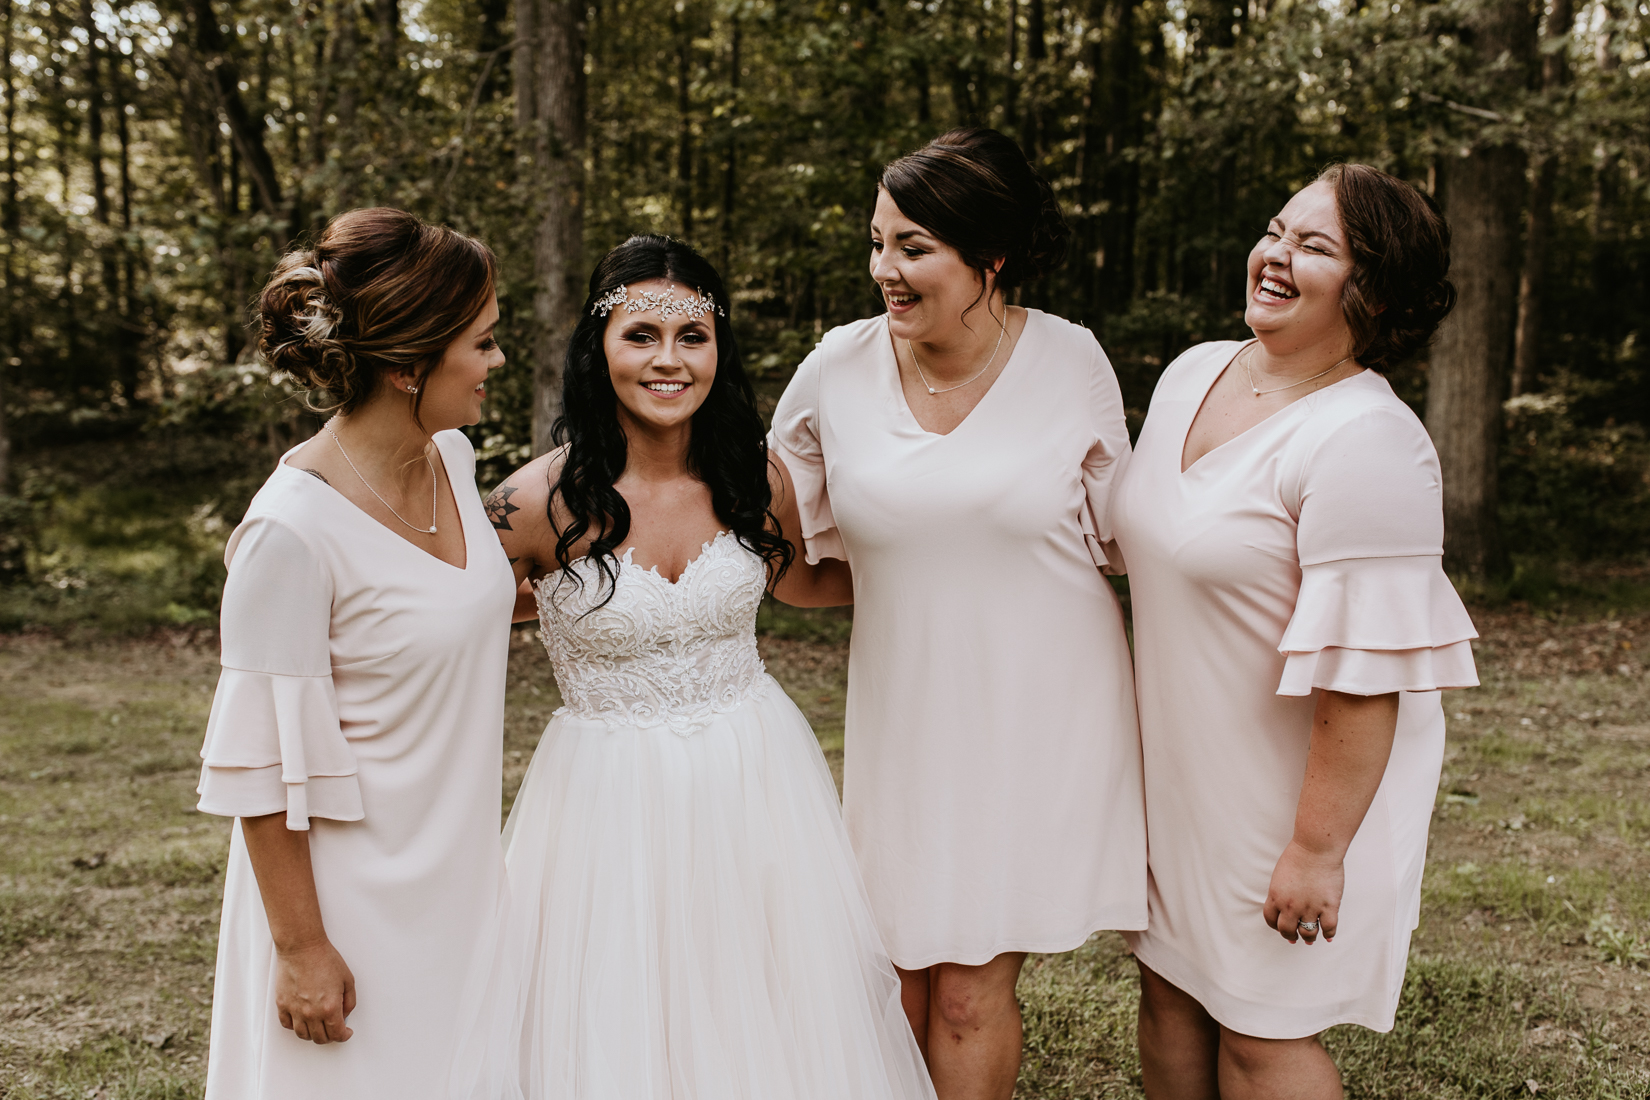 olivia_zay_wedding_09_2018-8688.jpg